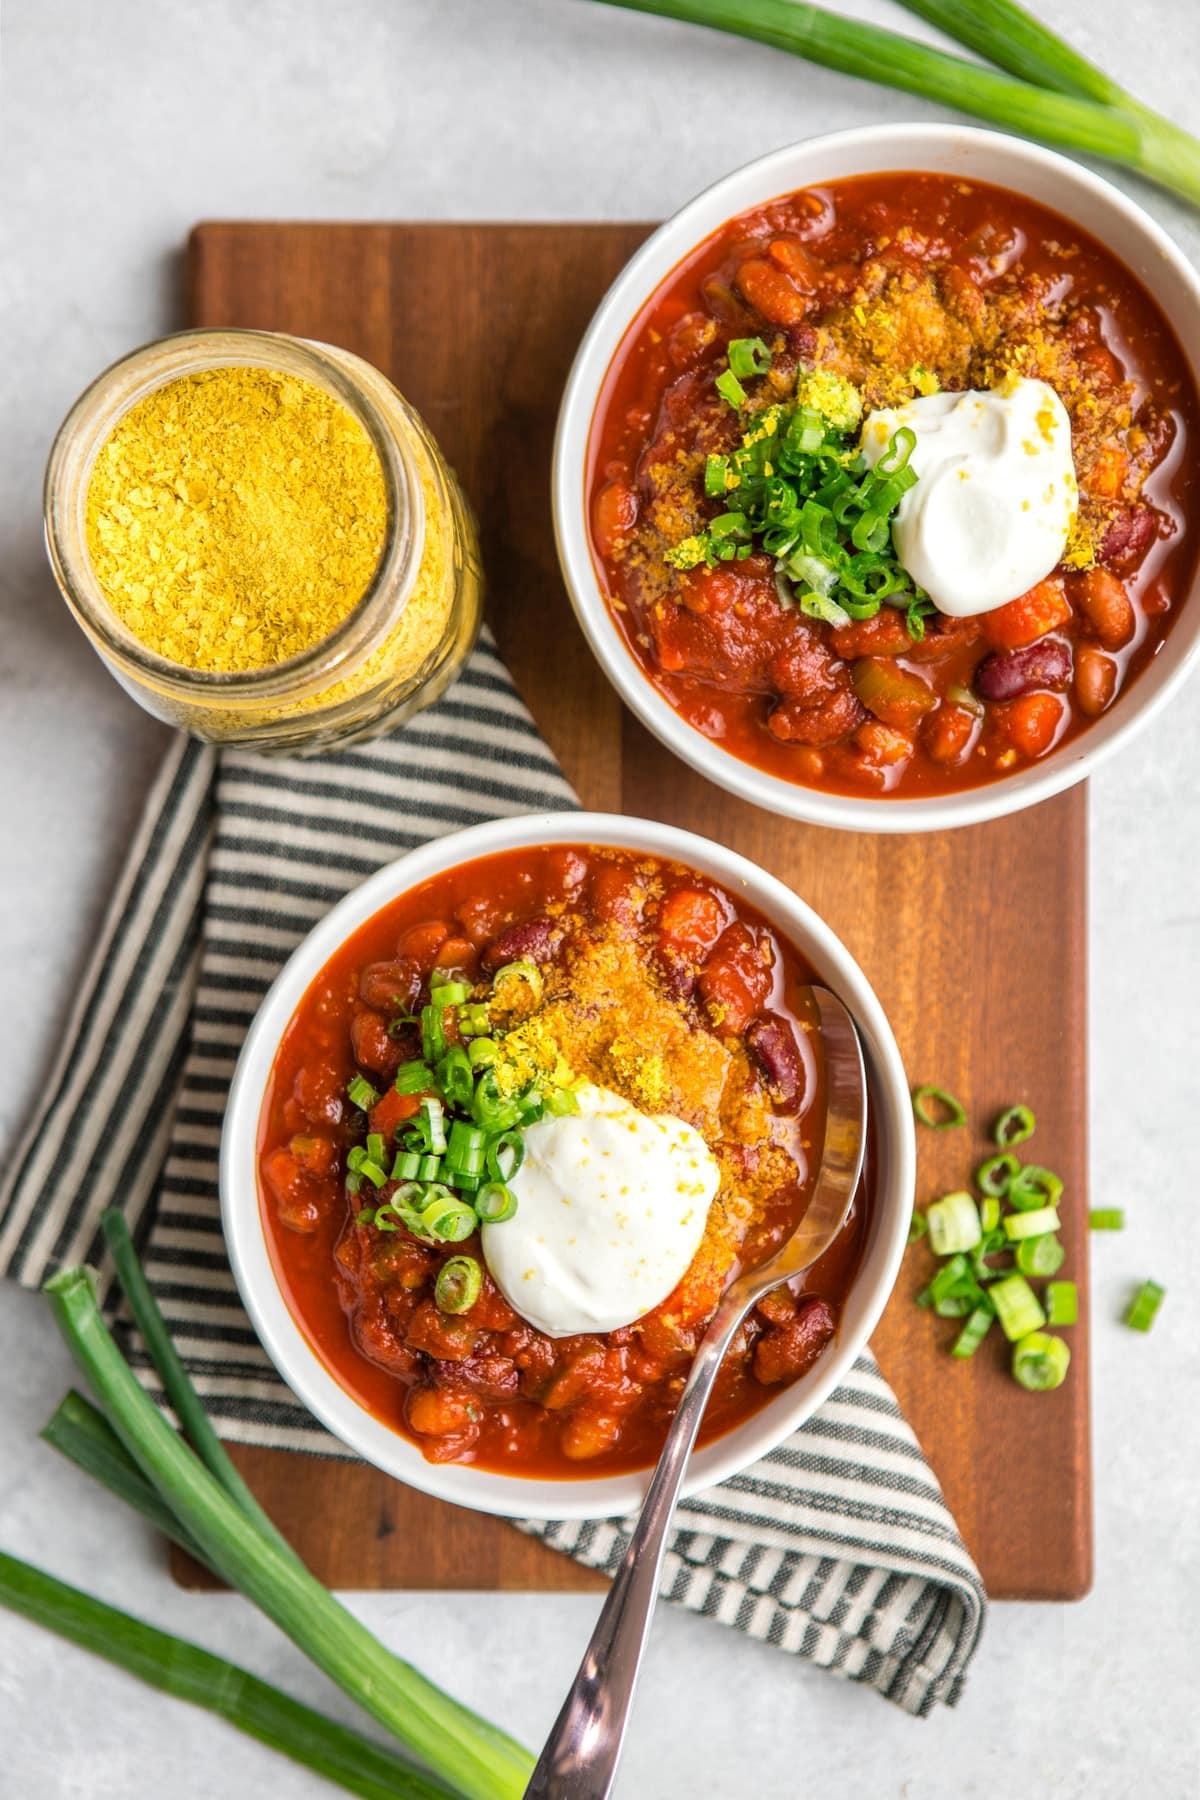 Easy Vegan Chili Recipe From My Bowl